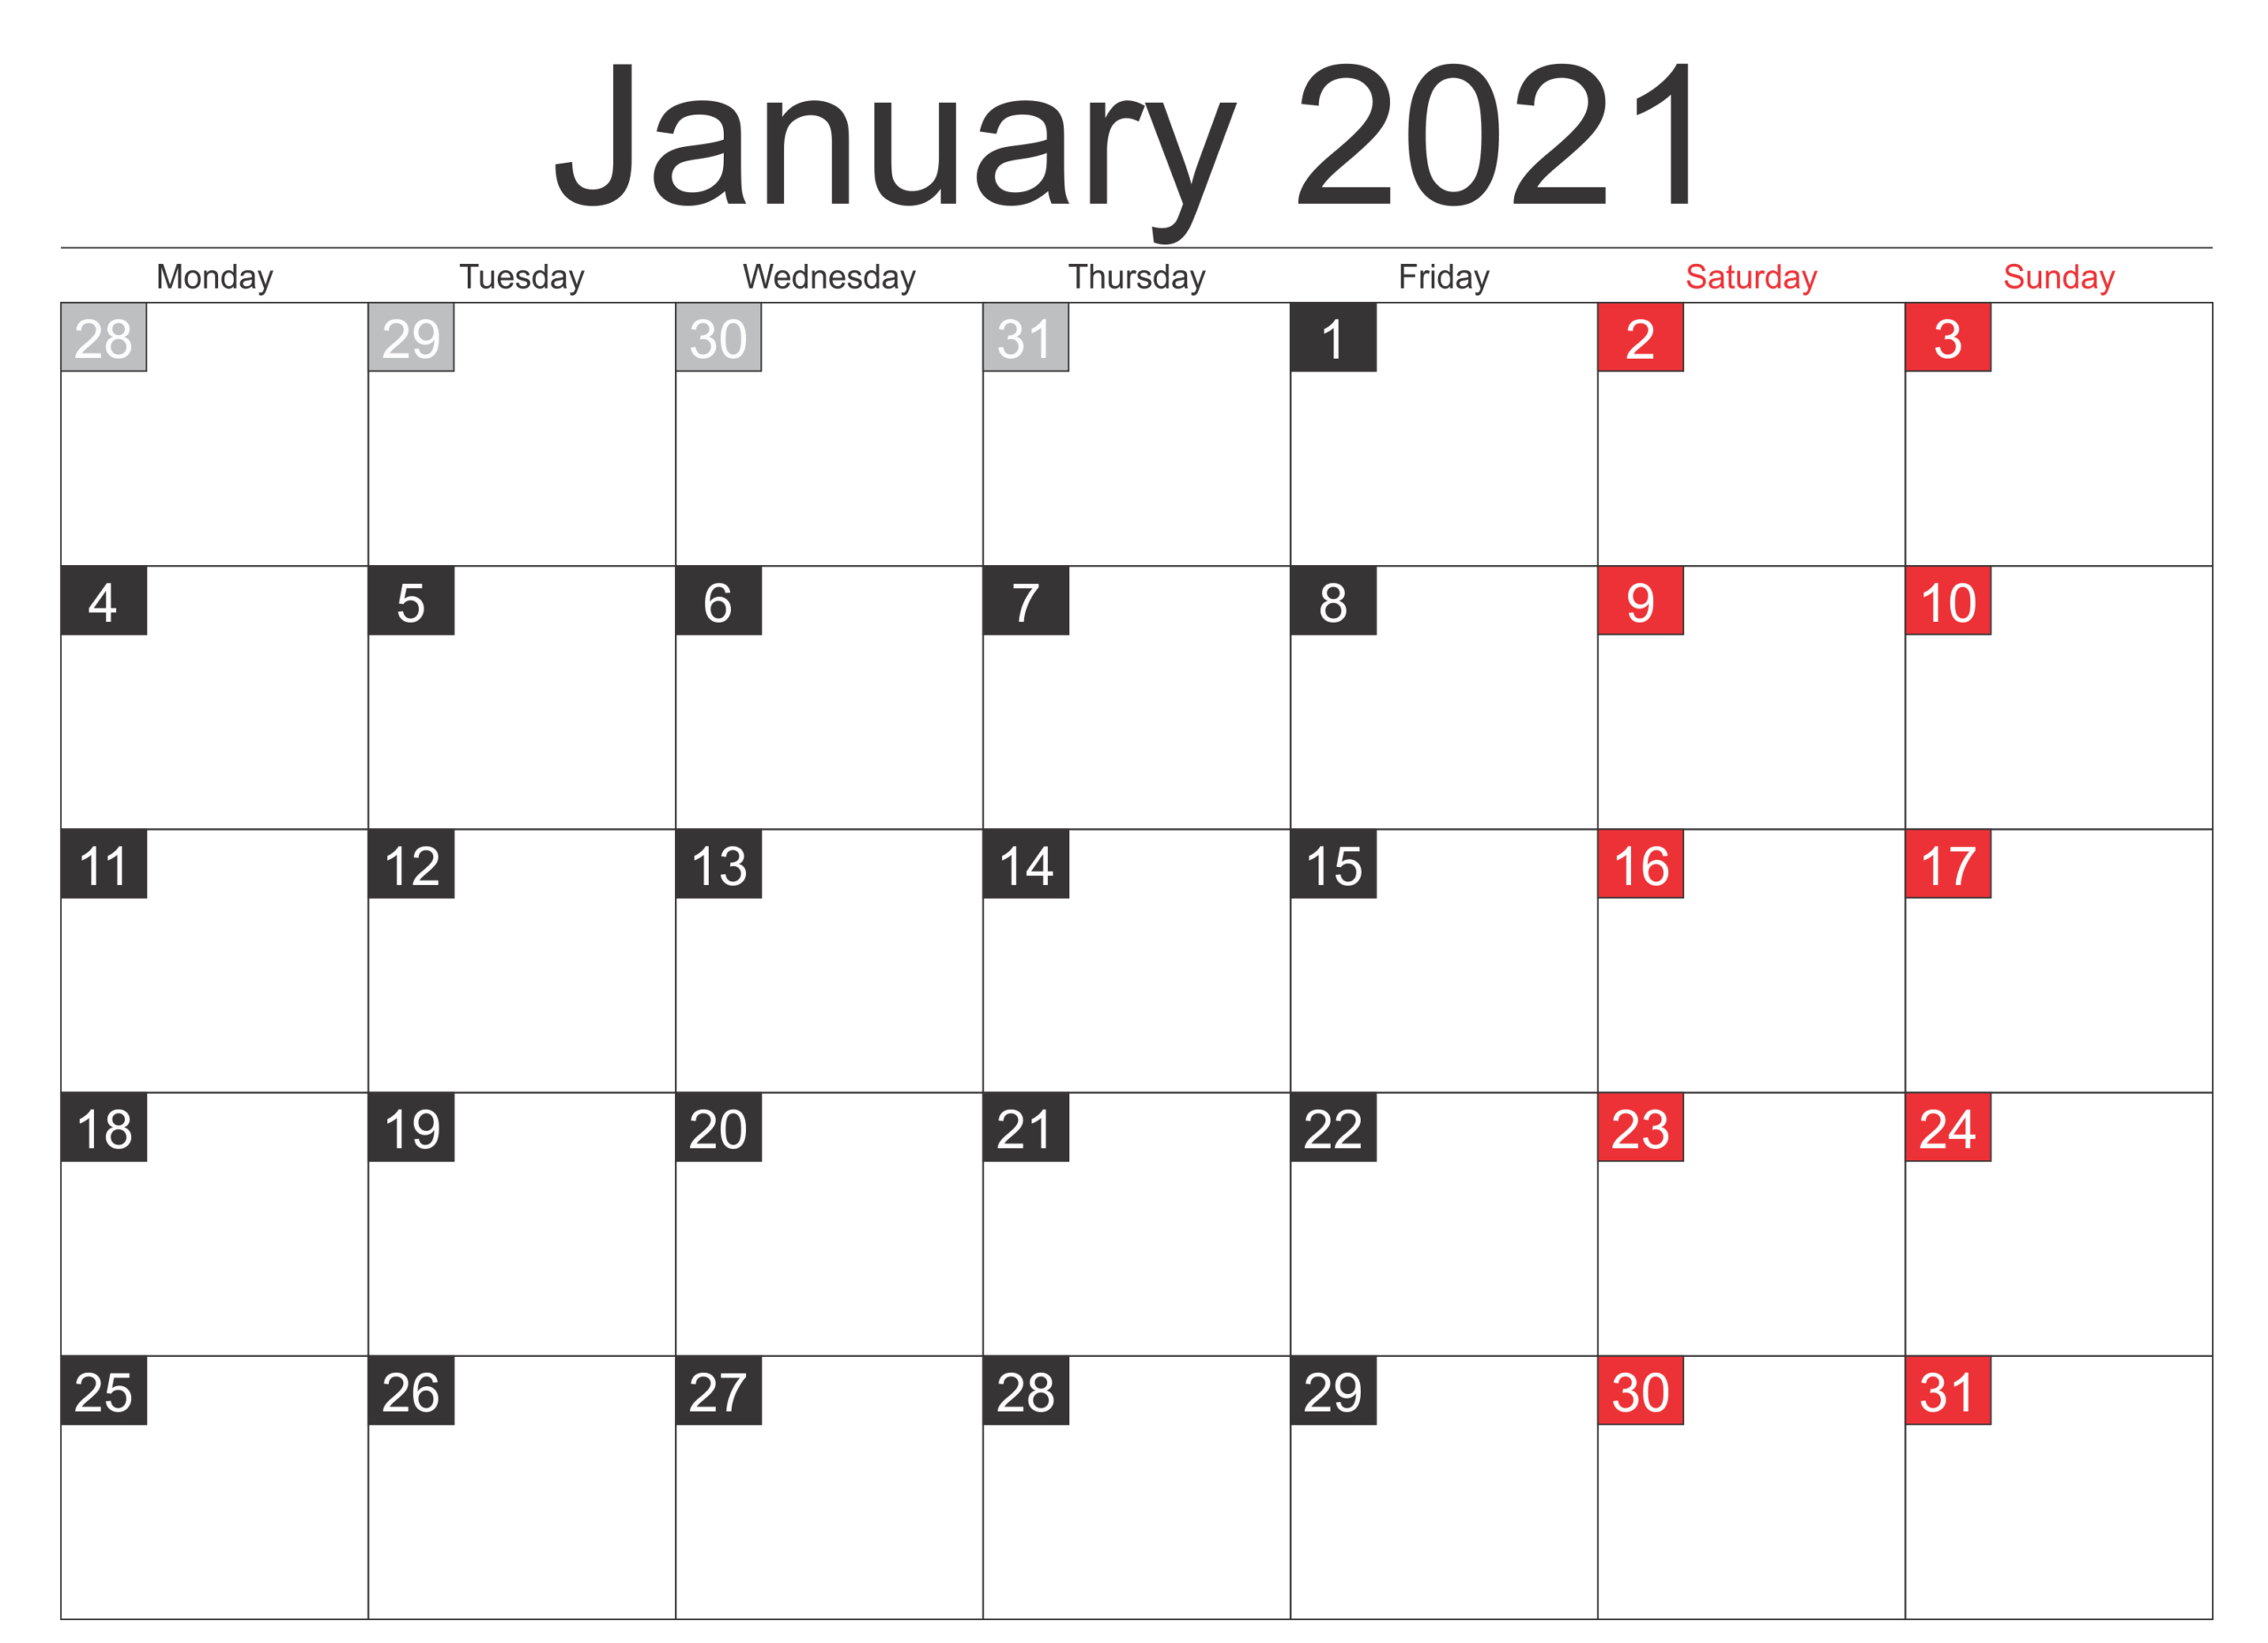 Print Calendar For January 2021 Holidays Sheet